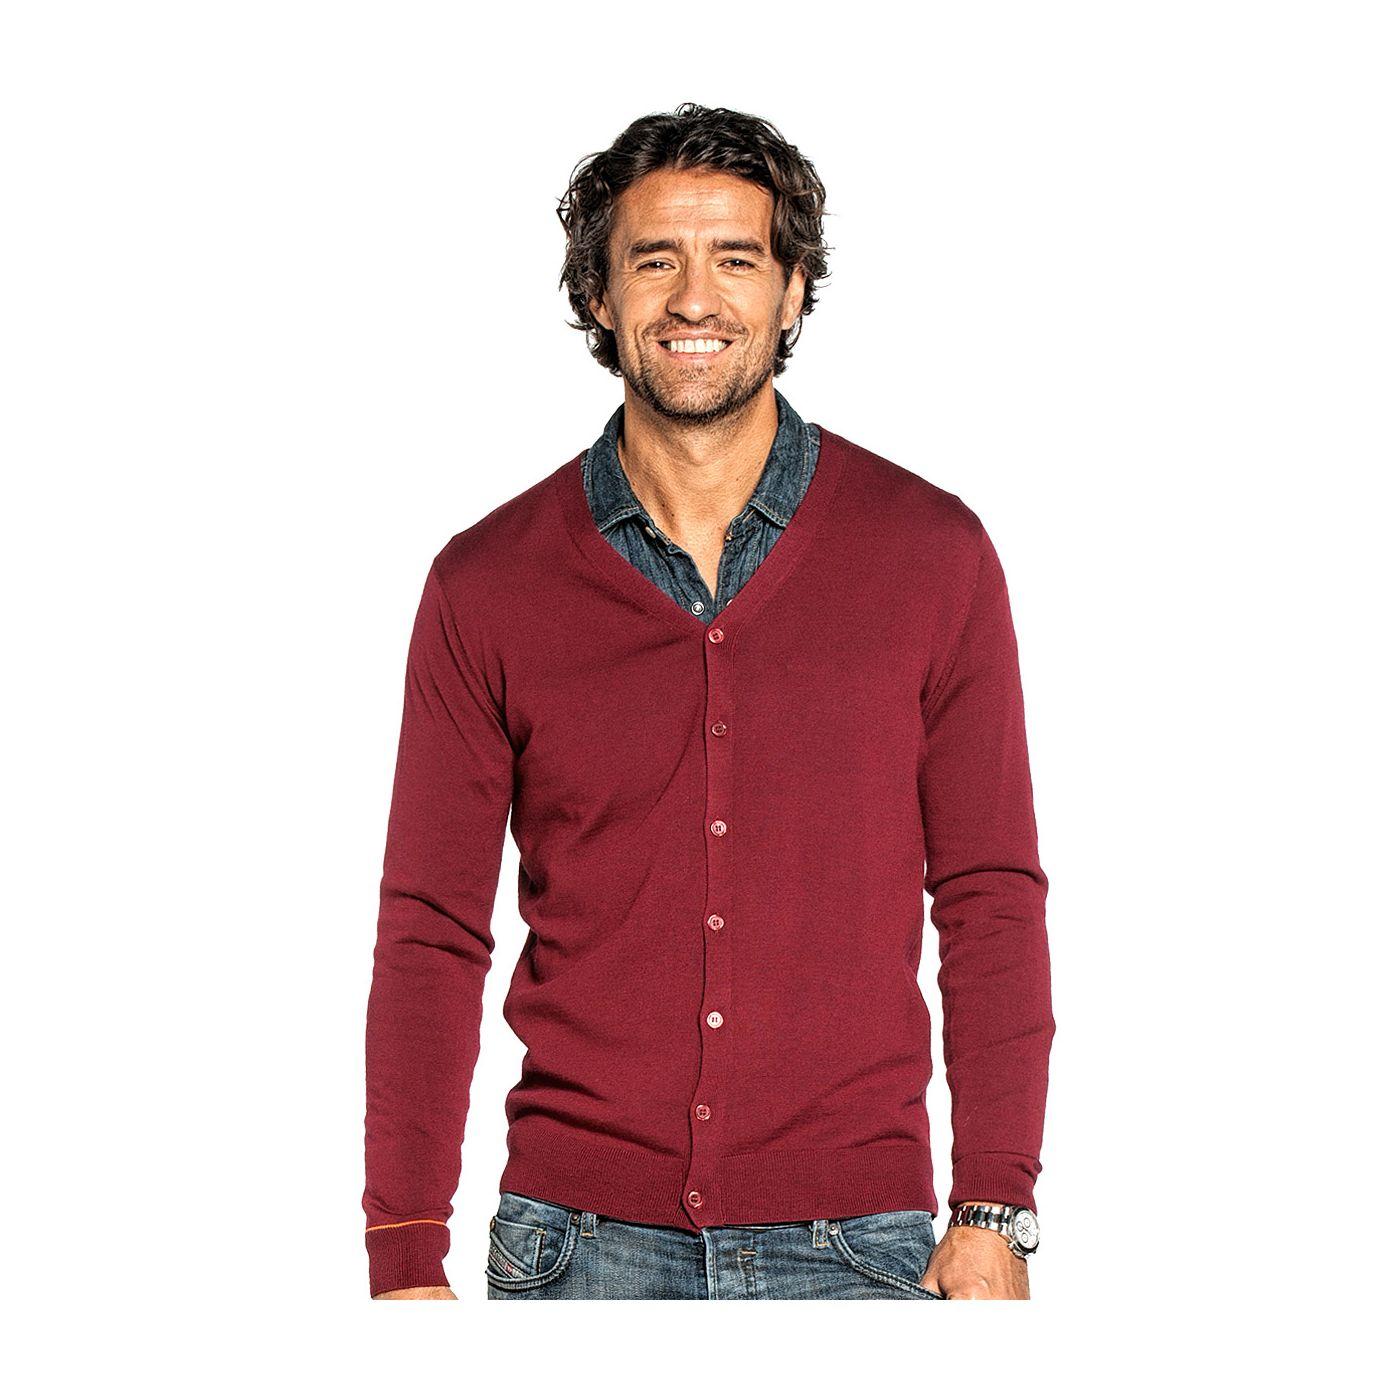 Cardigan for men made of Merino wool in Red